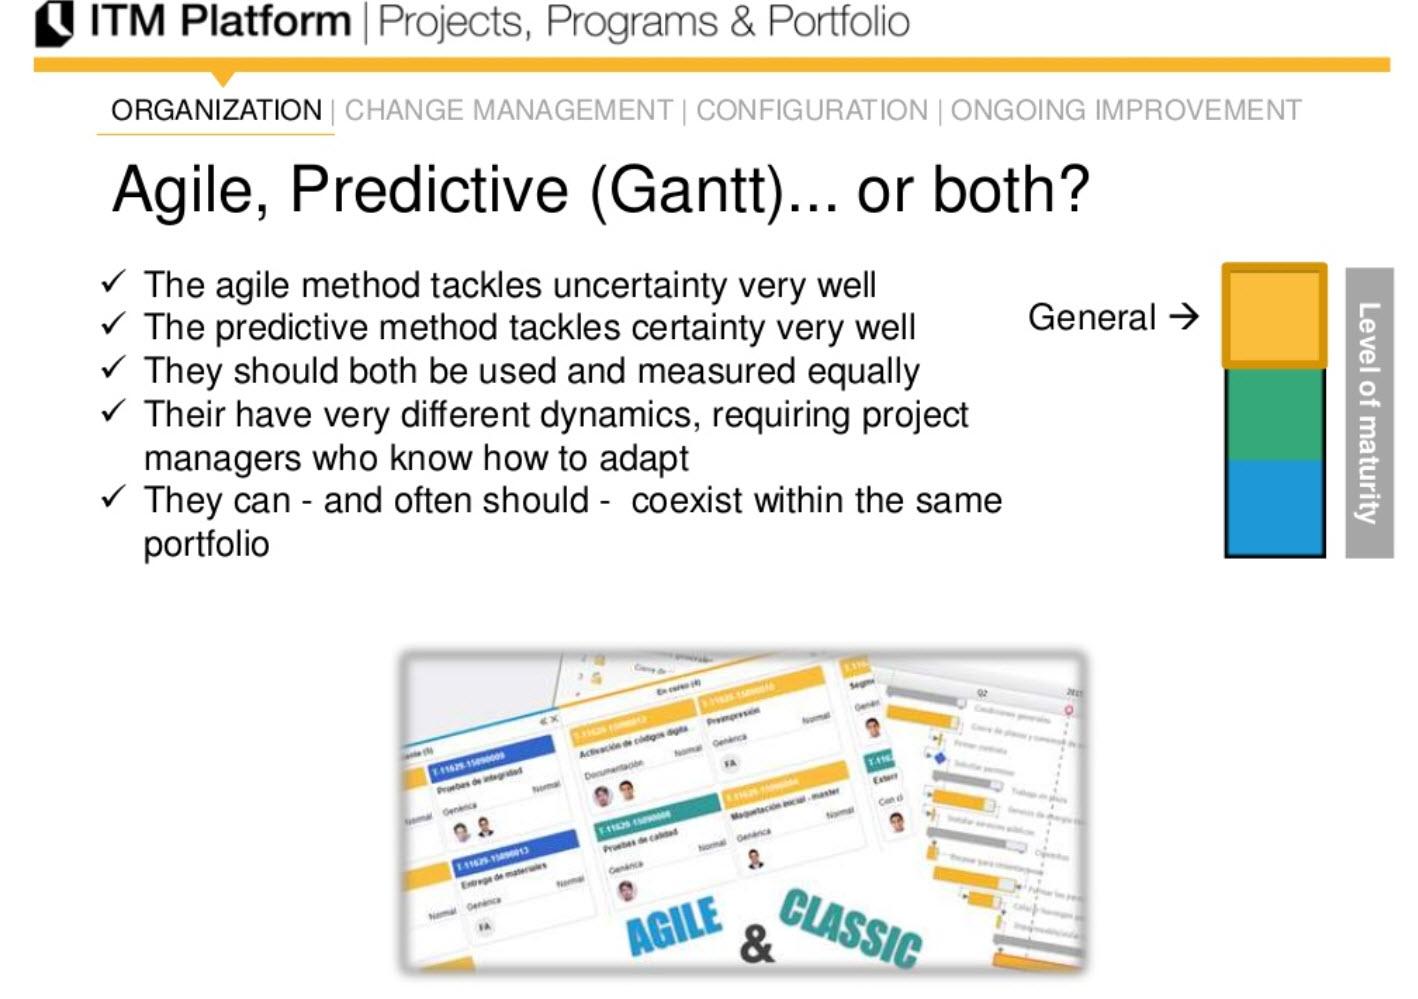 Agile, predicitve (Gantt)... or both?